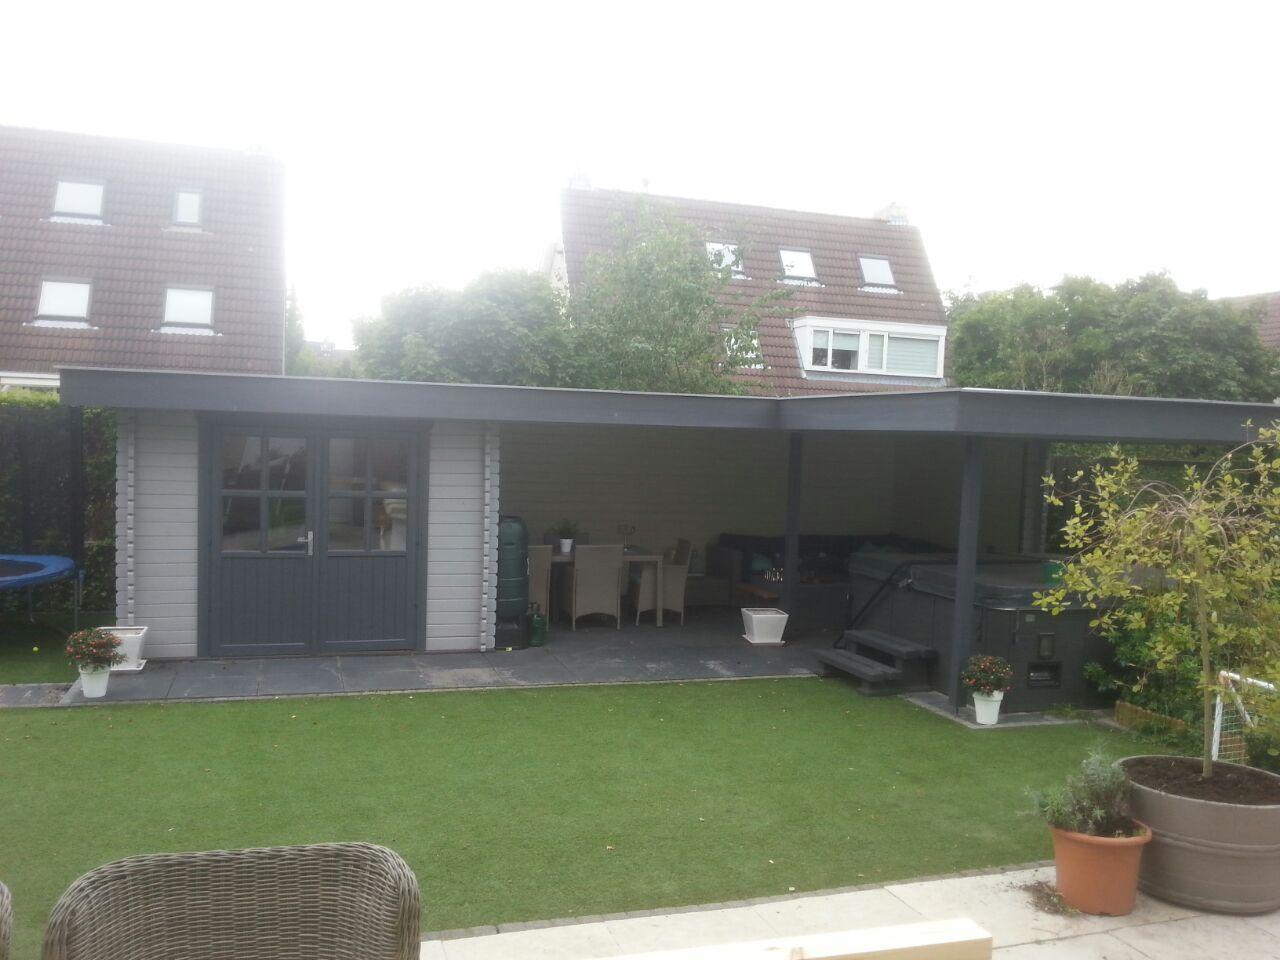 M28b luifel met hoek 300x300 500x300ad zd 300x300 moderne tuinhuis blokhut met plat dak en - Pergola met dak ...